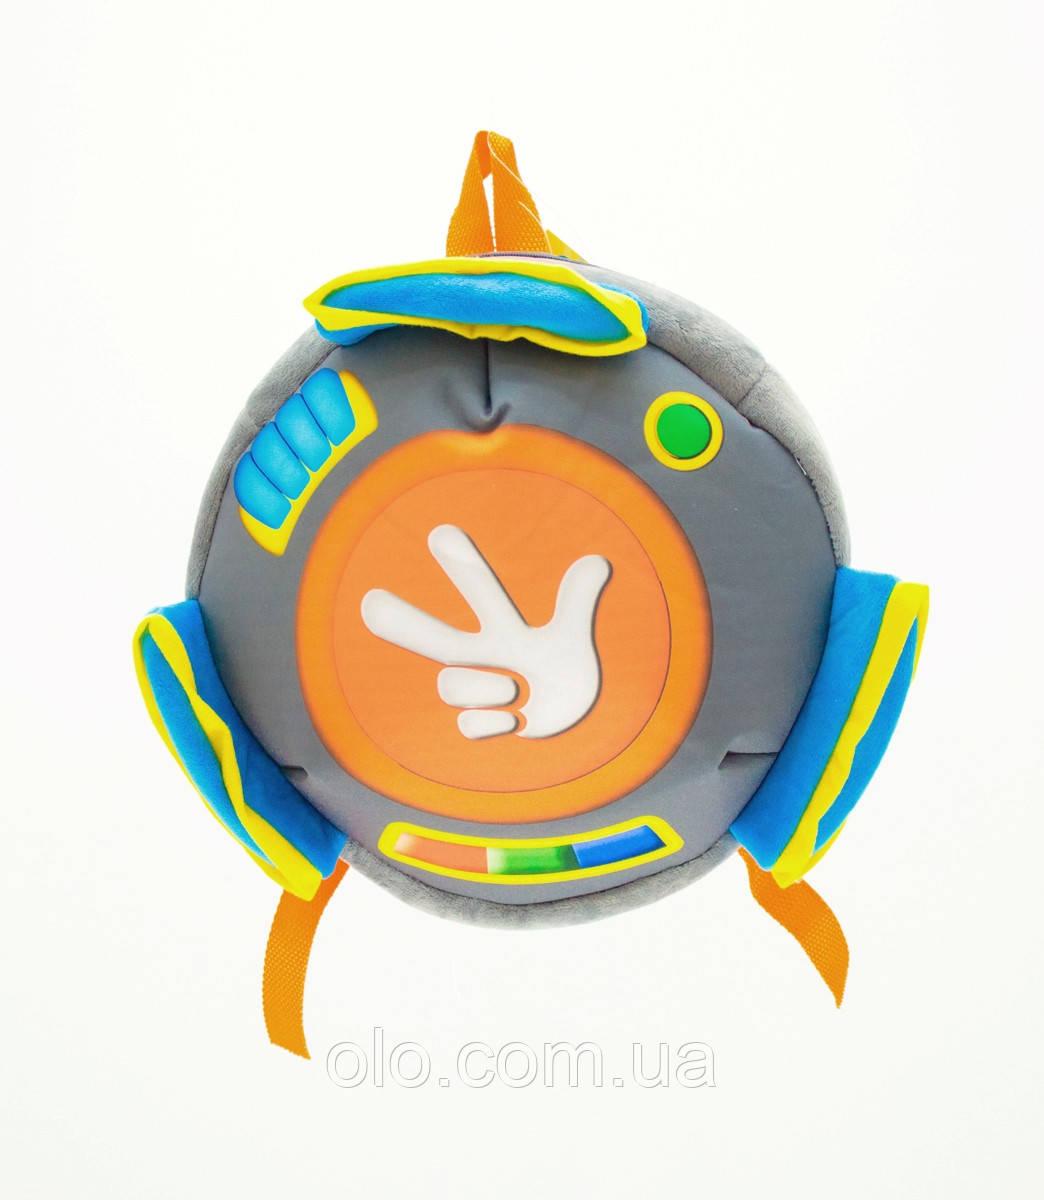 Фиксики - Помогатор 19